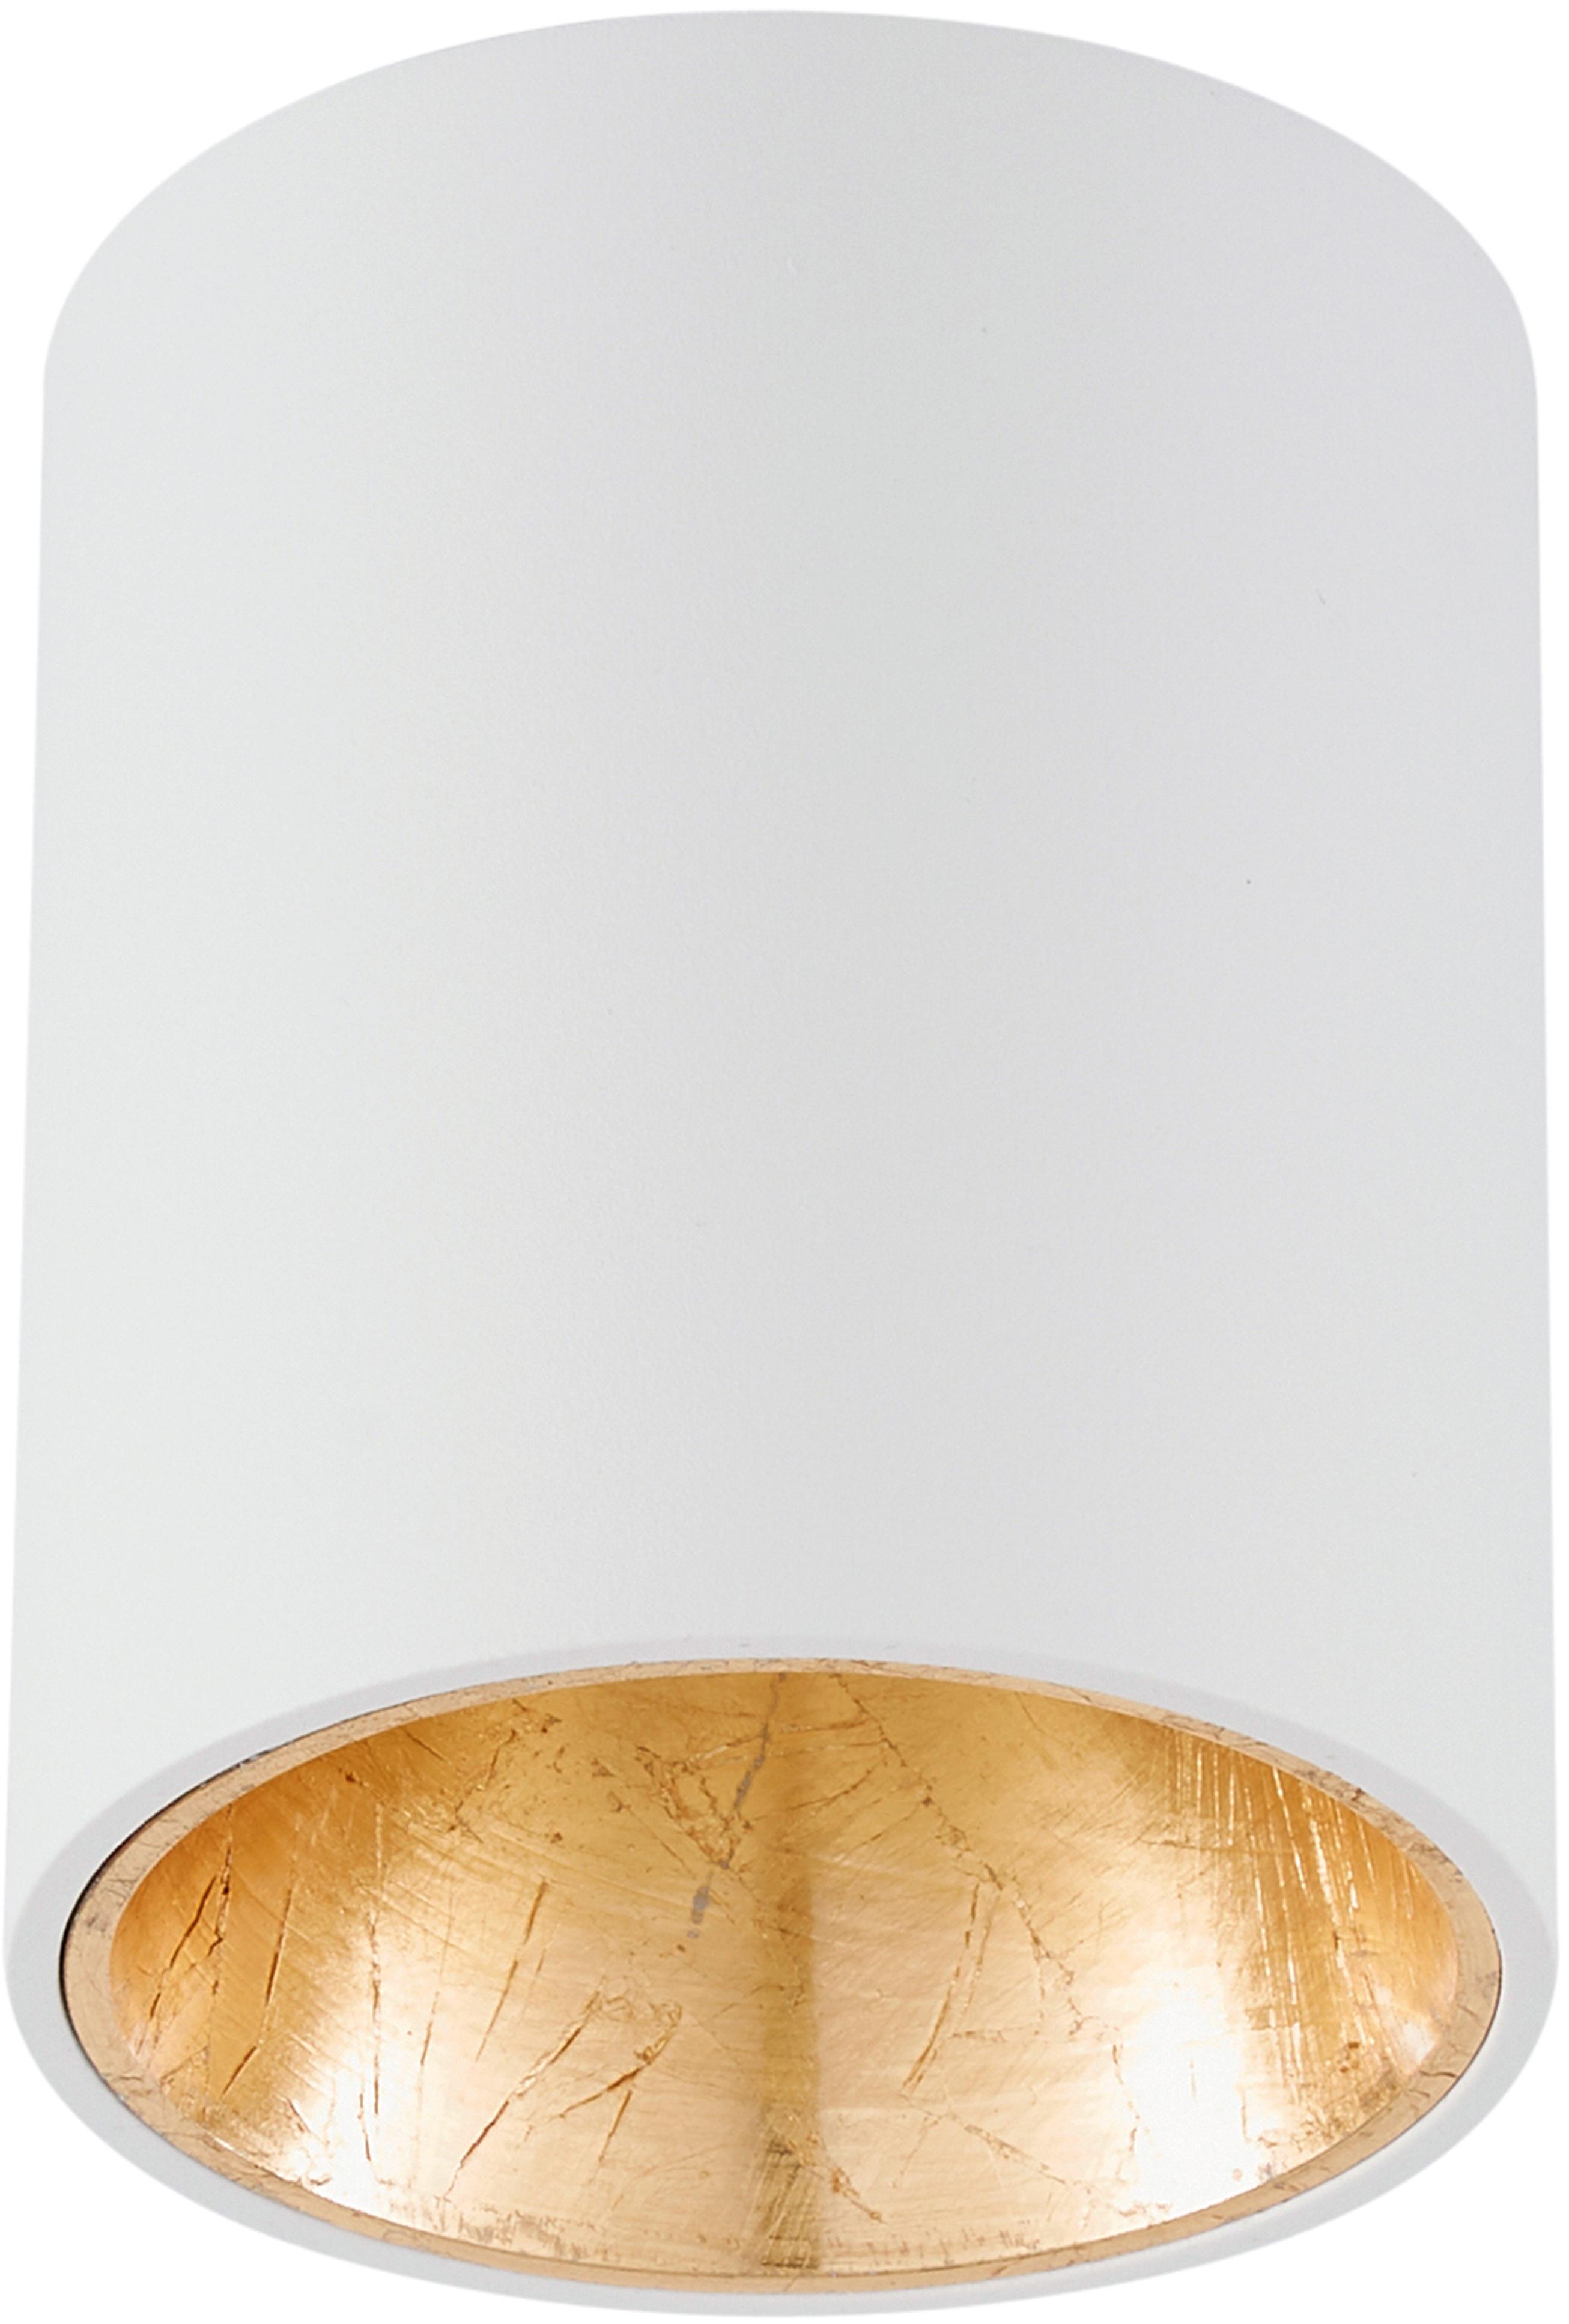 LED Deckenspot Marty, Weiss, Goldfarben, ∅ 10 x H 12 cm